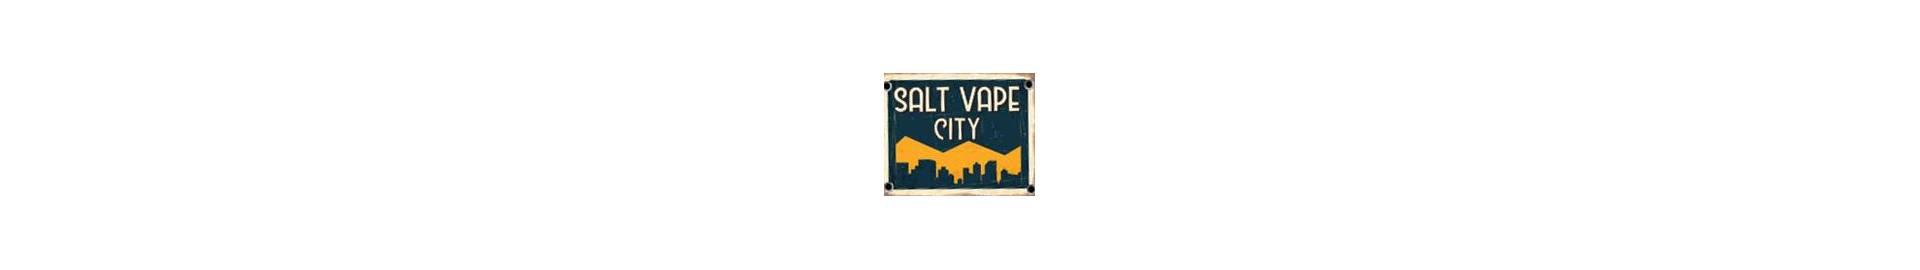 Salt Vape City E-liquids  | Royalsmoke.co.uk